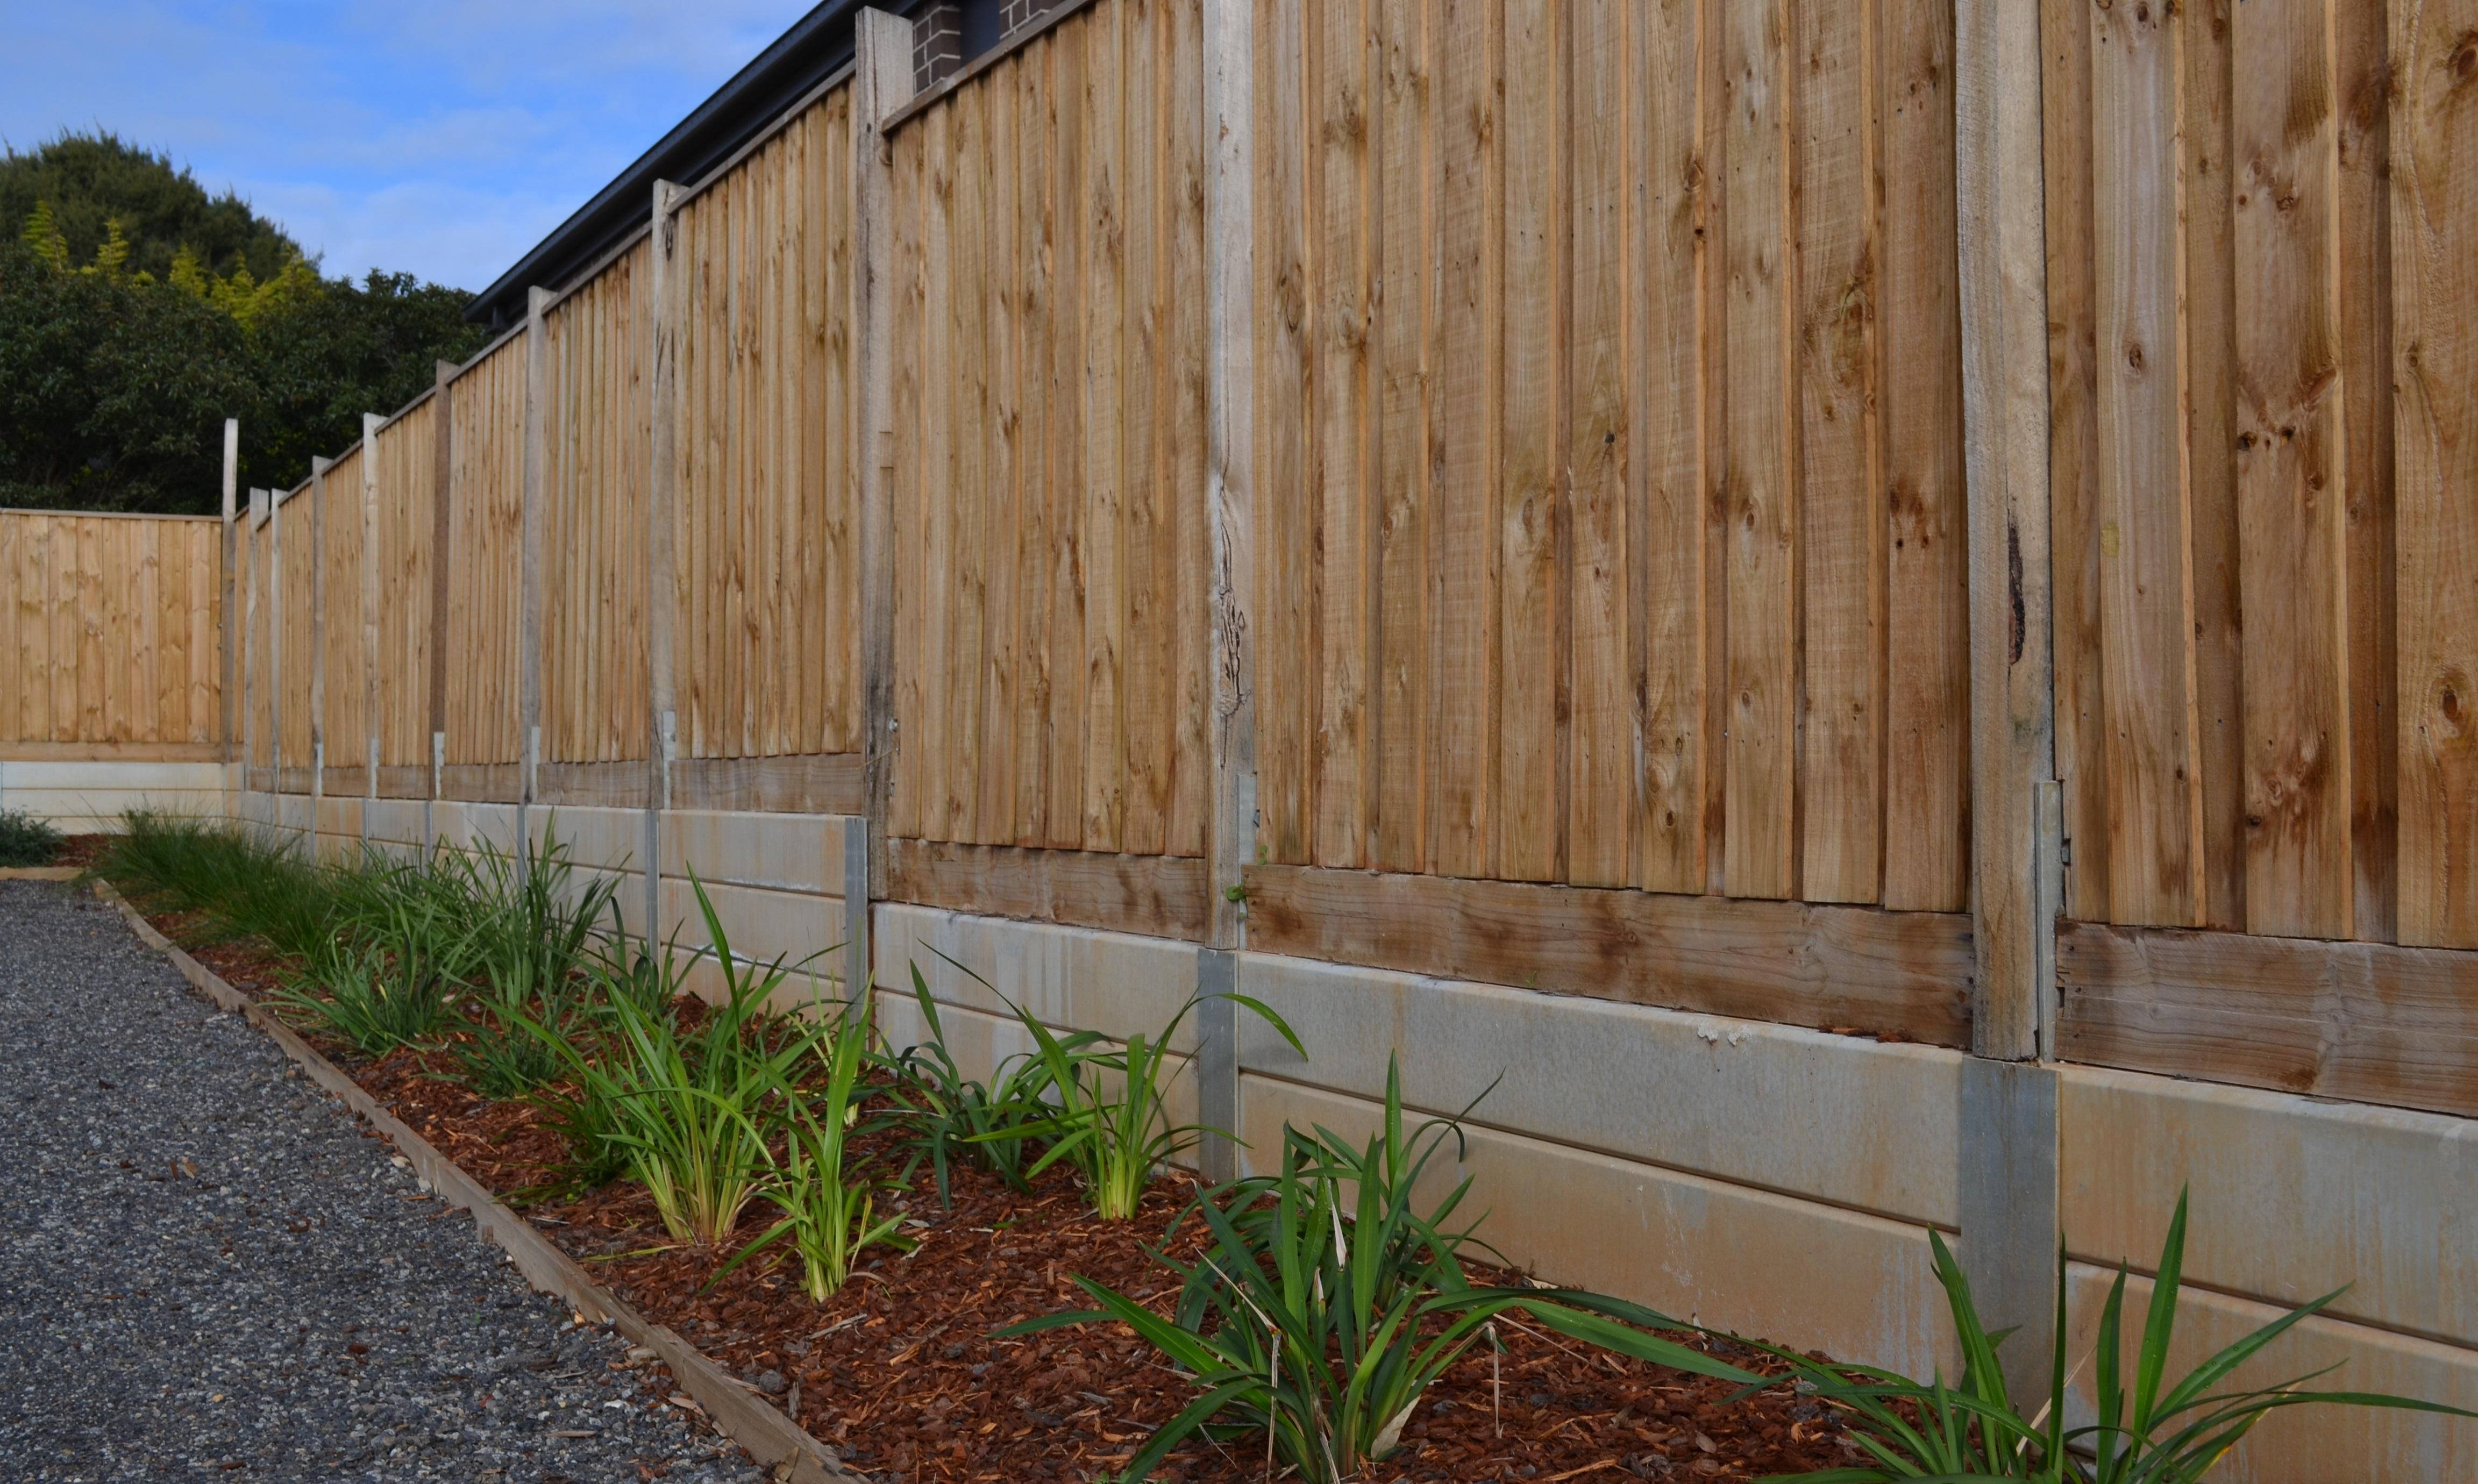 retaining wall, galvanised post, steel post prices, steel posts Melbourne, retaining wall ideas, retaining walls, star picket melbourne region, concrete sleepers home garden building materials